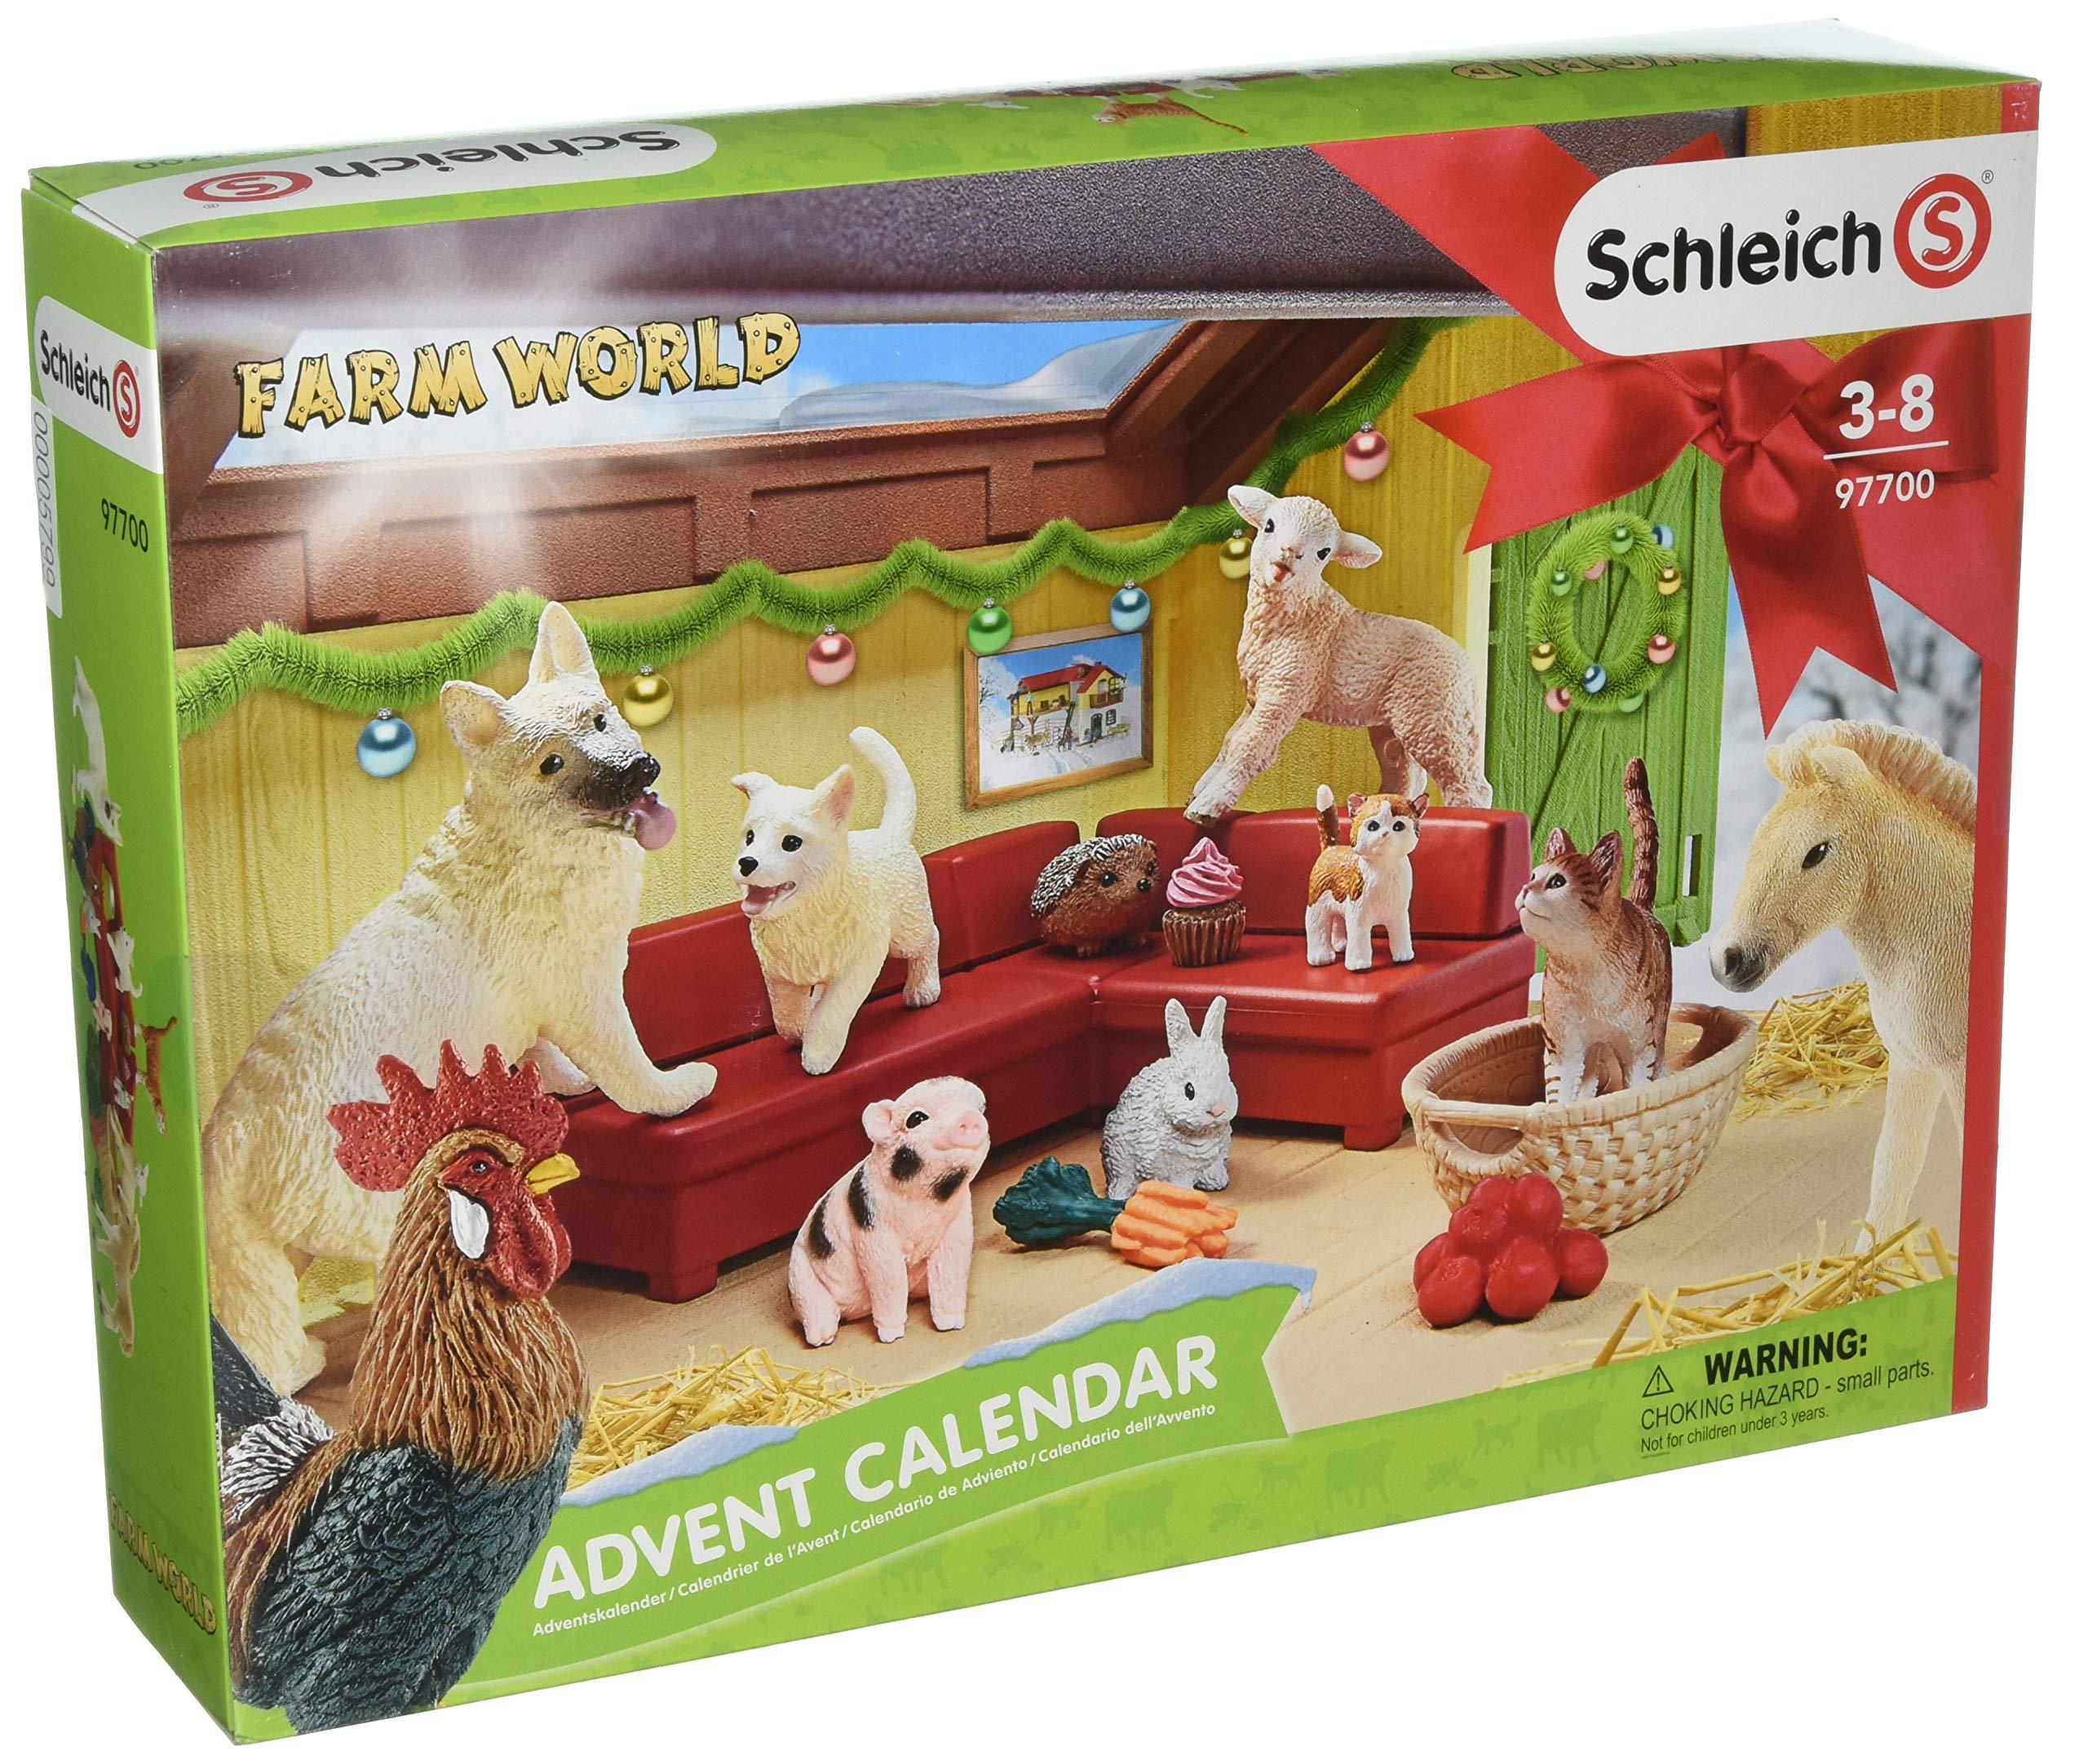 Schleich Farm World 2018 Advent Calendar Toy, Multicolor